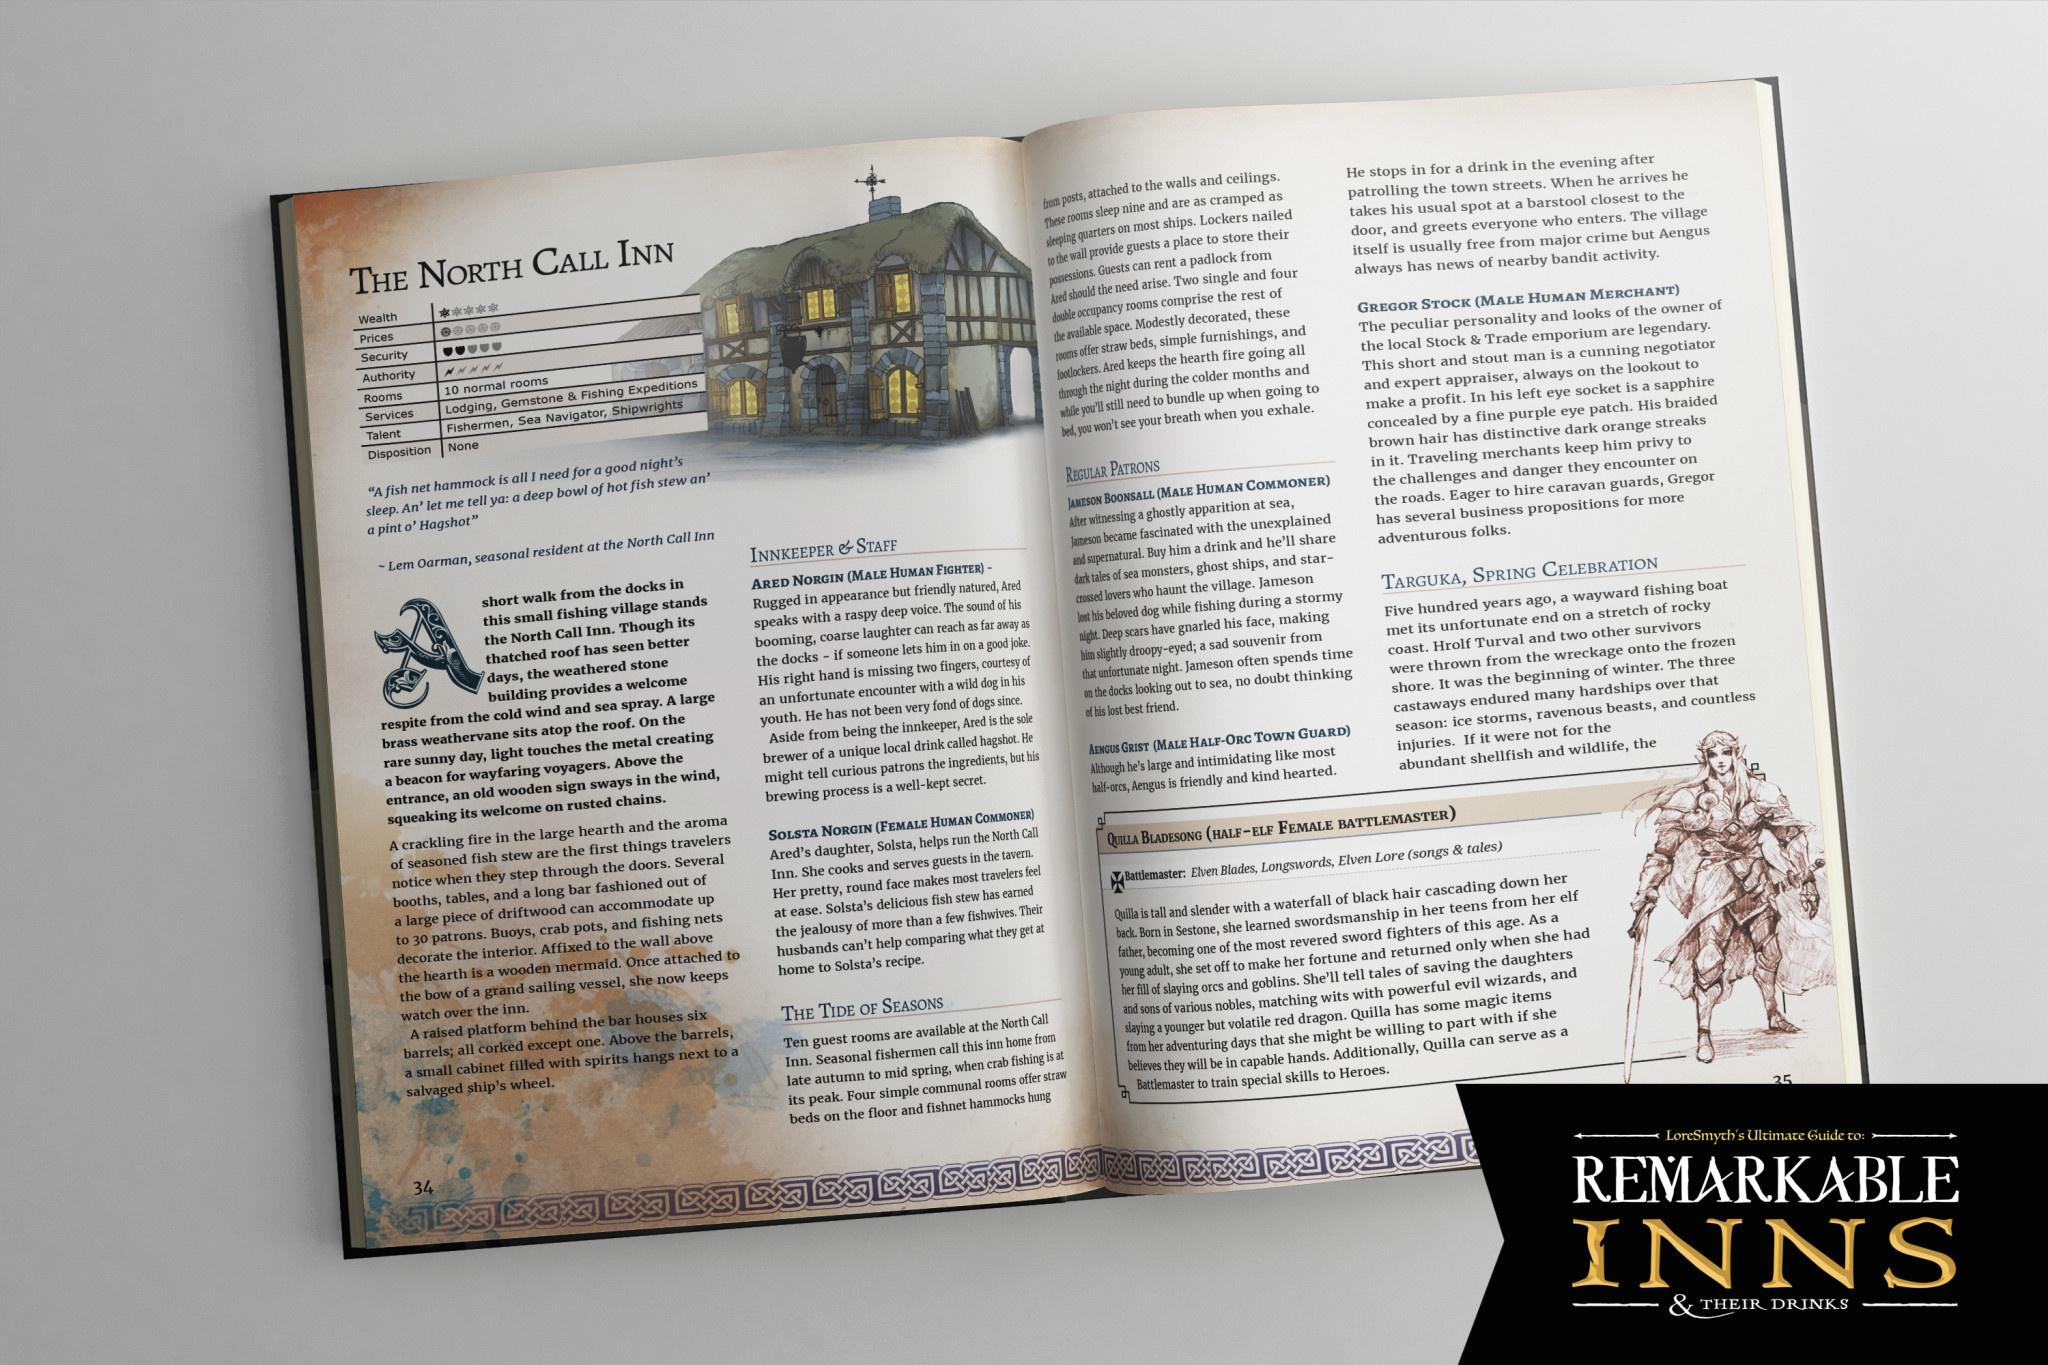 Remarkable Inns & Their Drinks (HC)